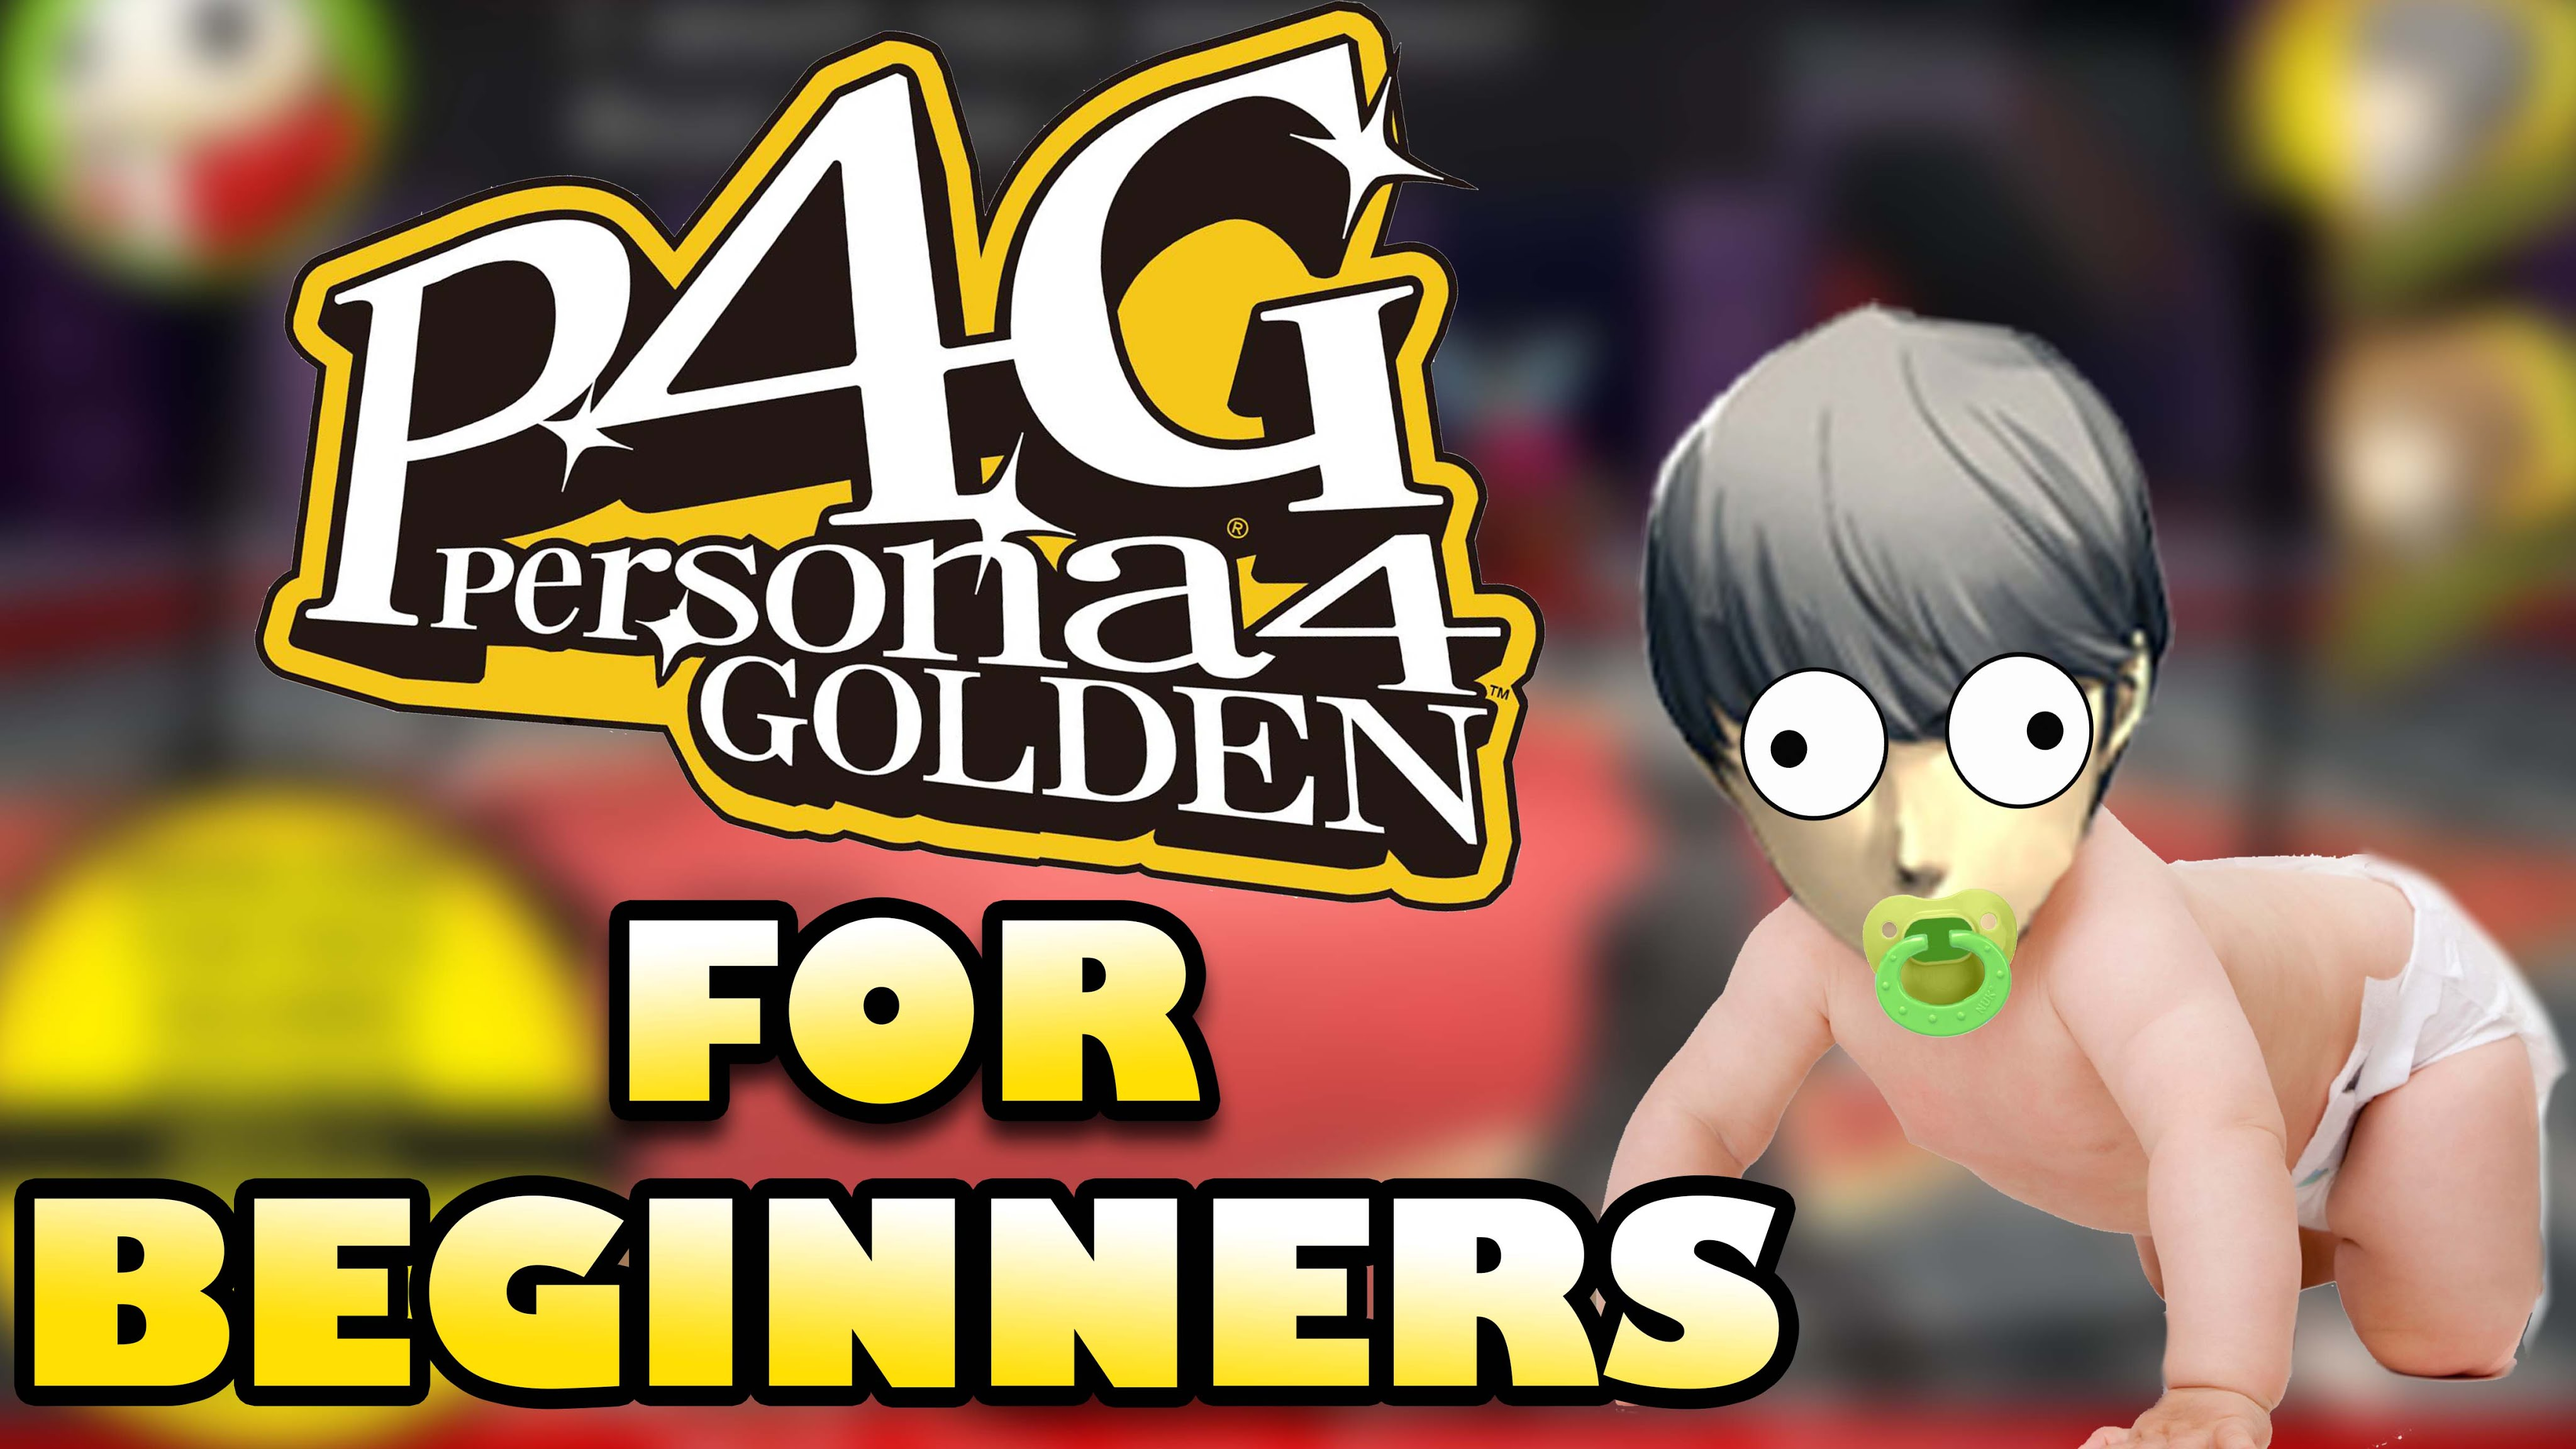 4096x2304 > Persona 4 Golden Wallpapers